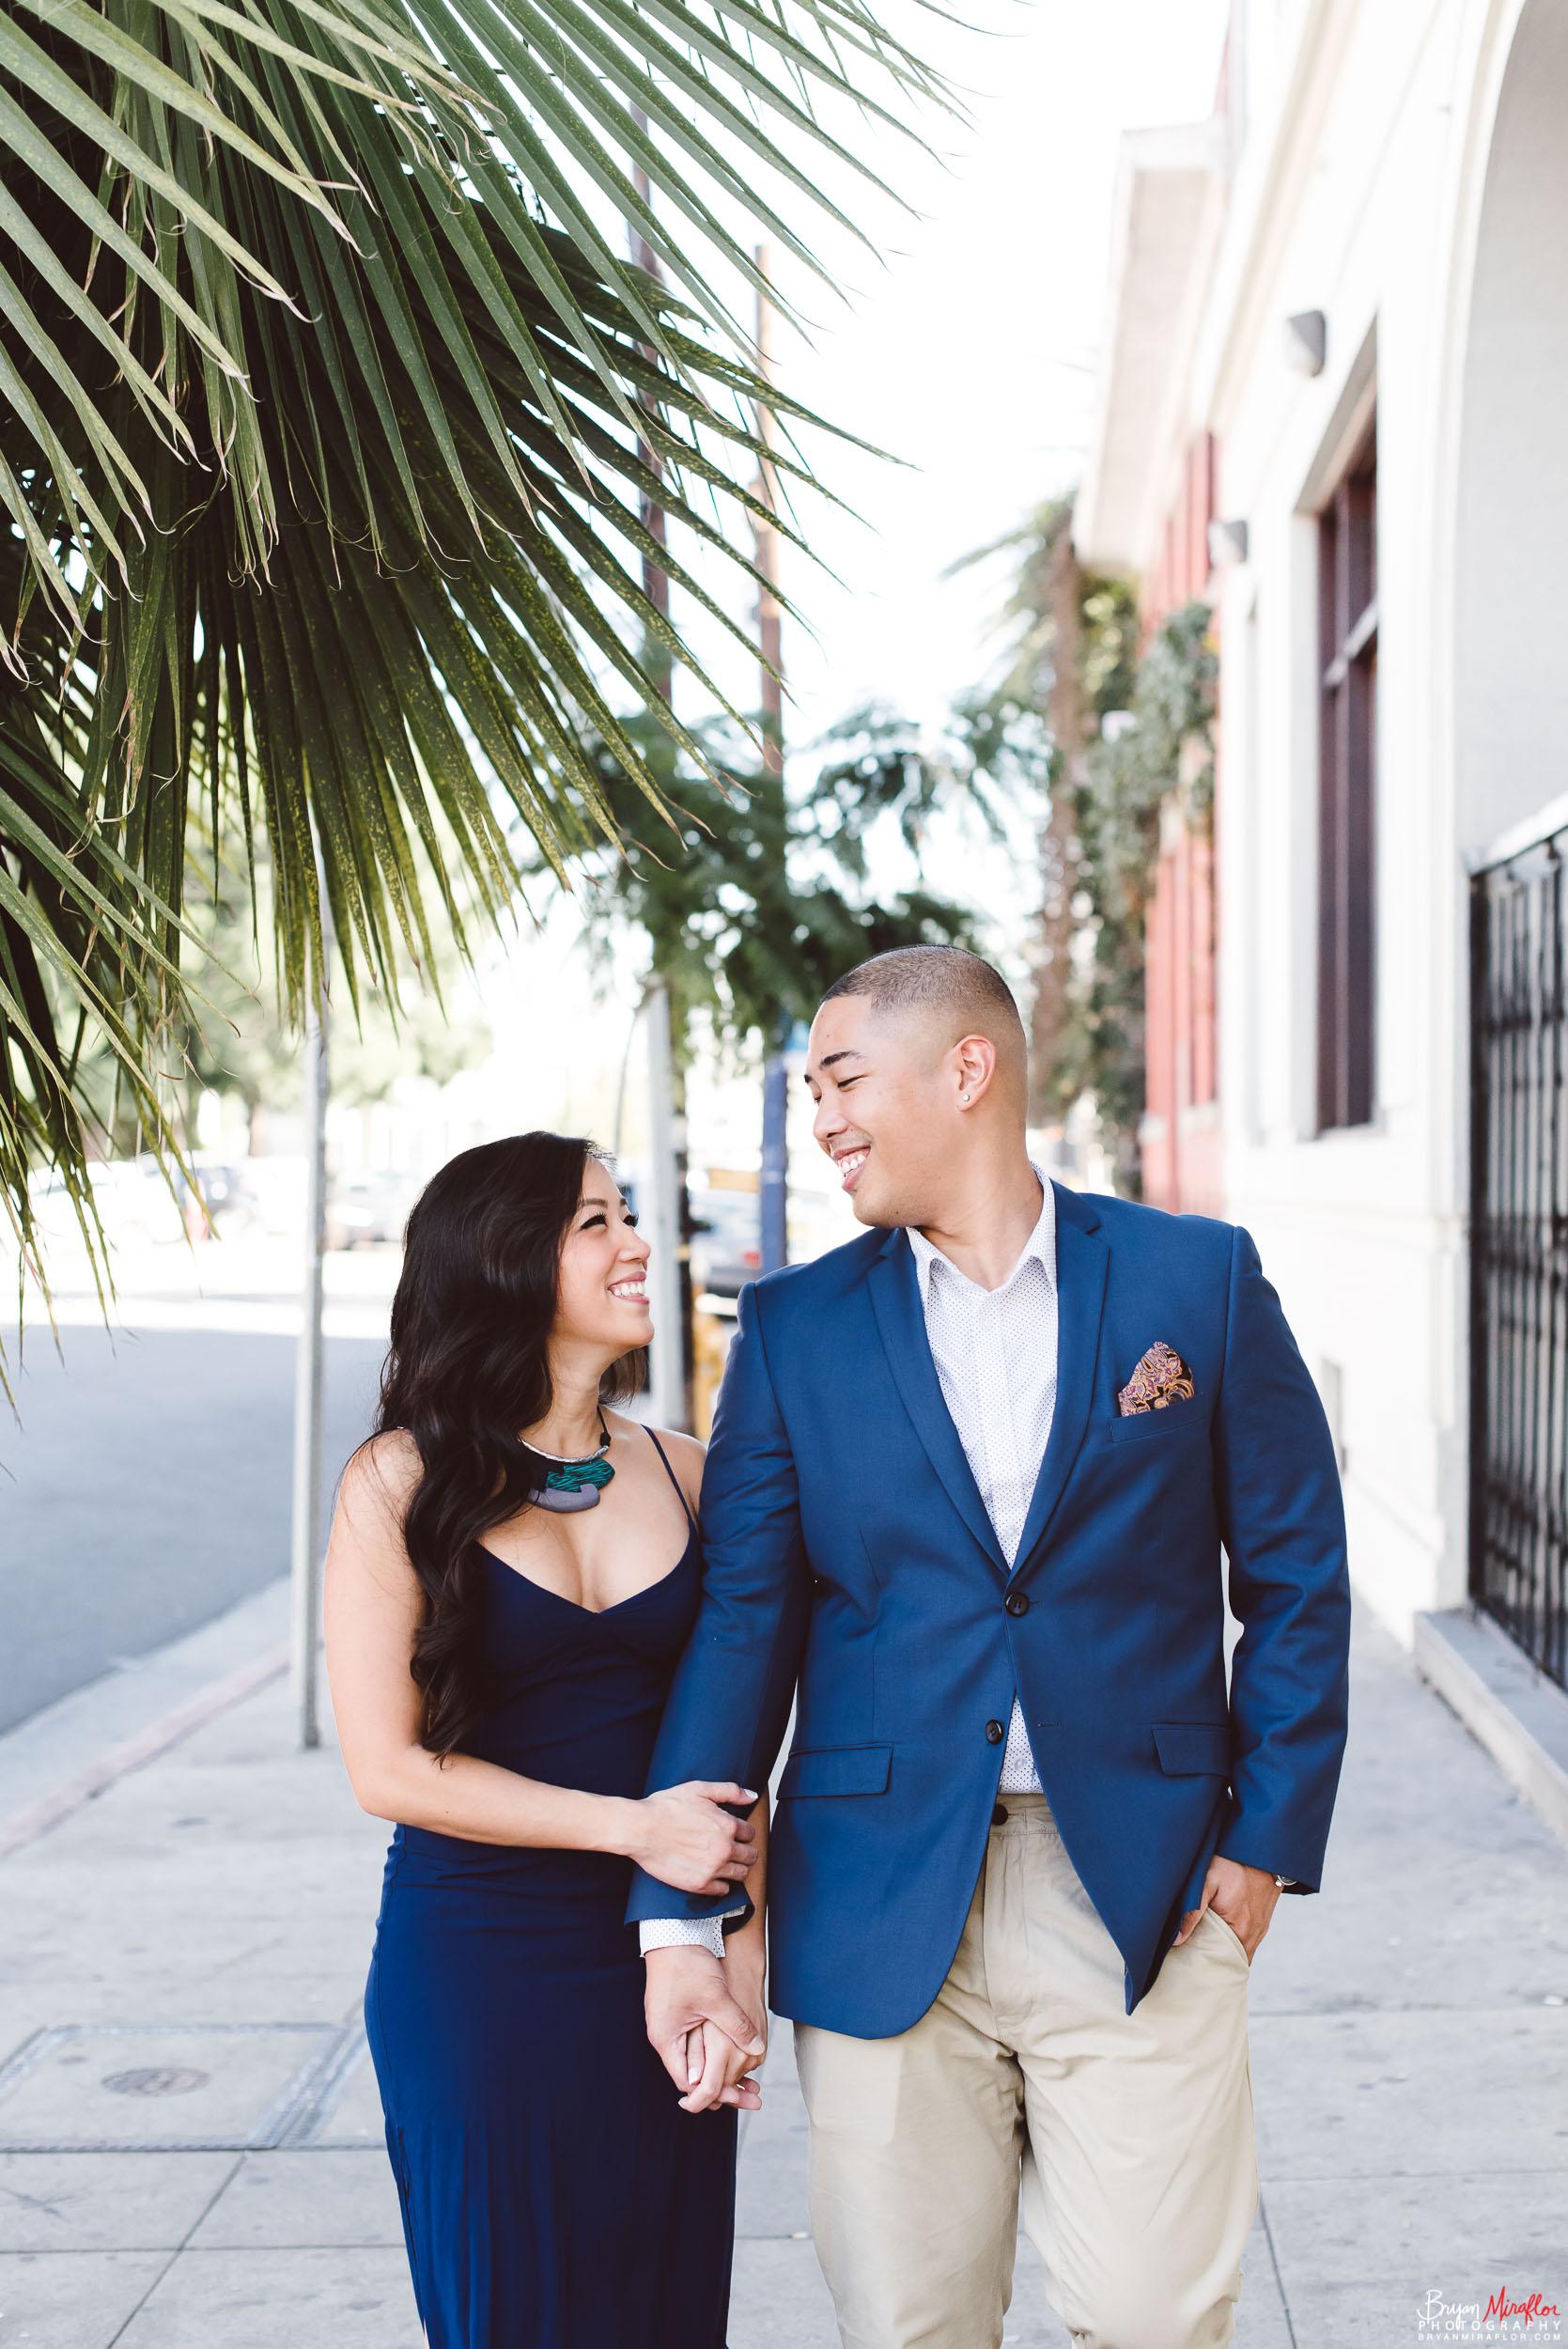 Bryan-Miraflor-Photography-Trisha-Dexter-Lopez-Engagement-Formal-DTLA-Arts-20170129-0039.jpg